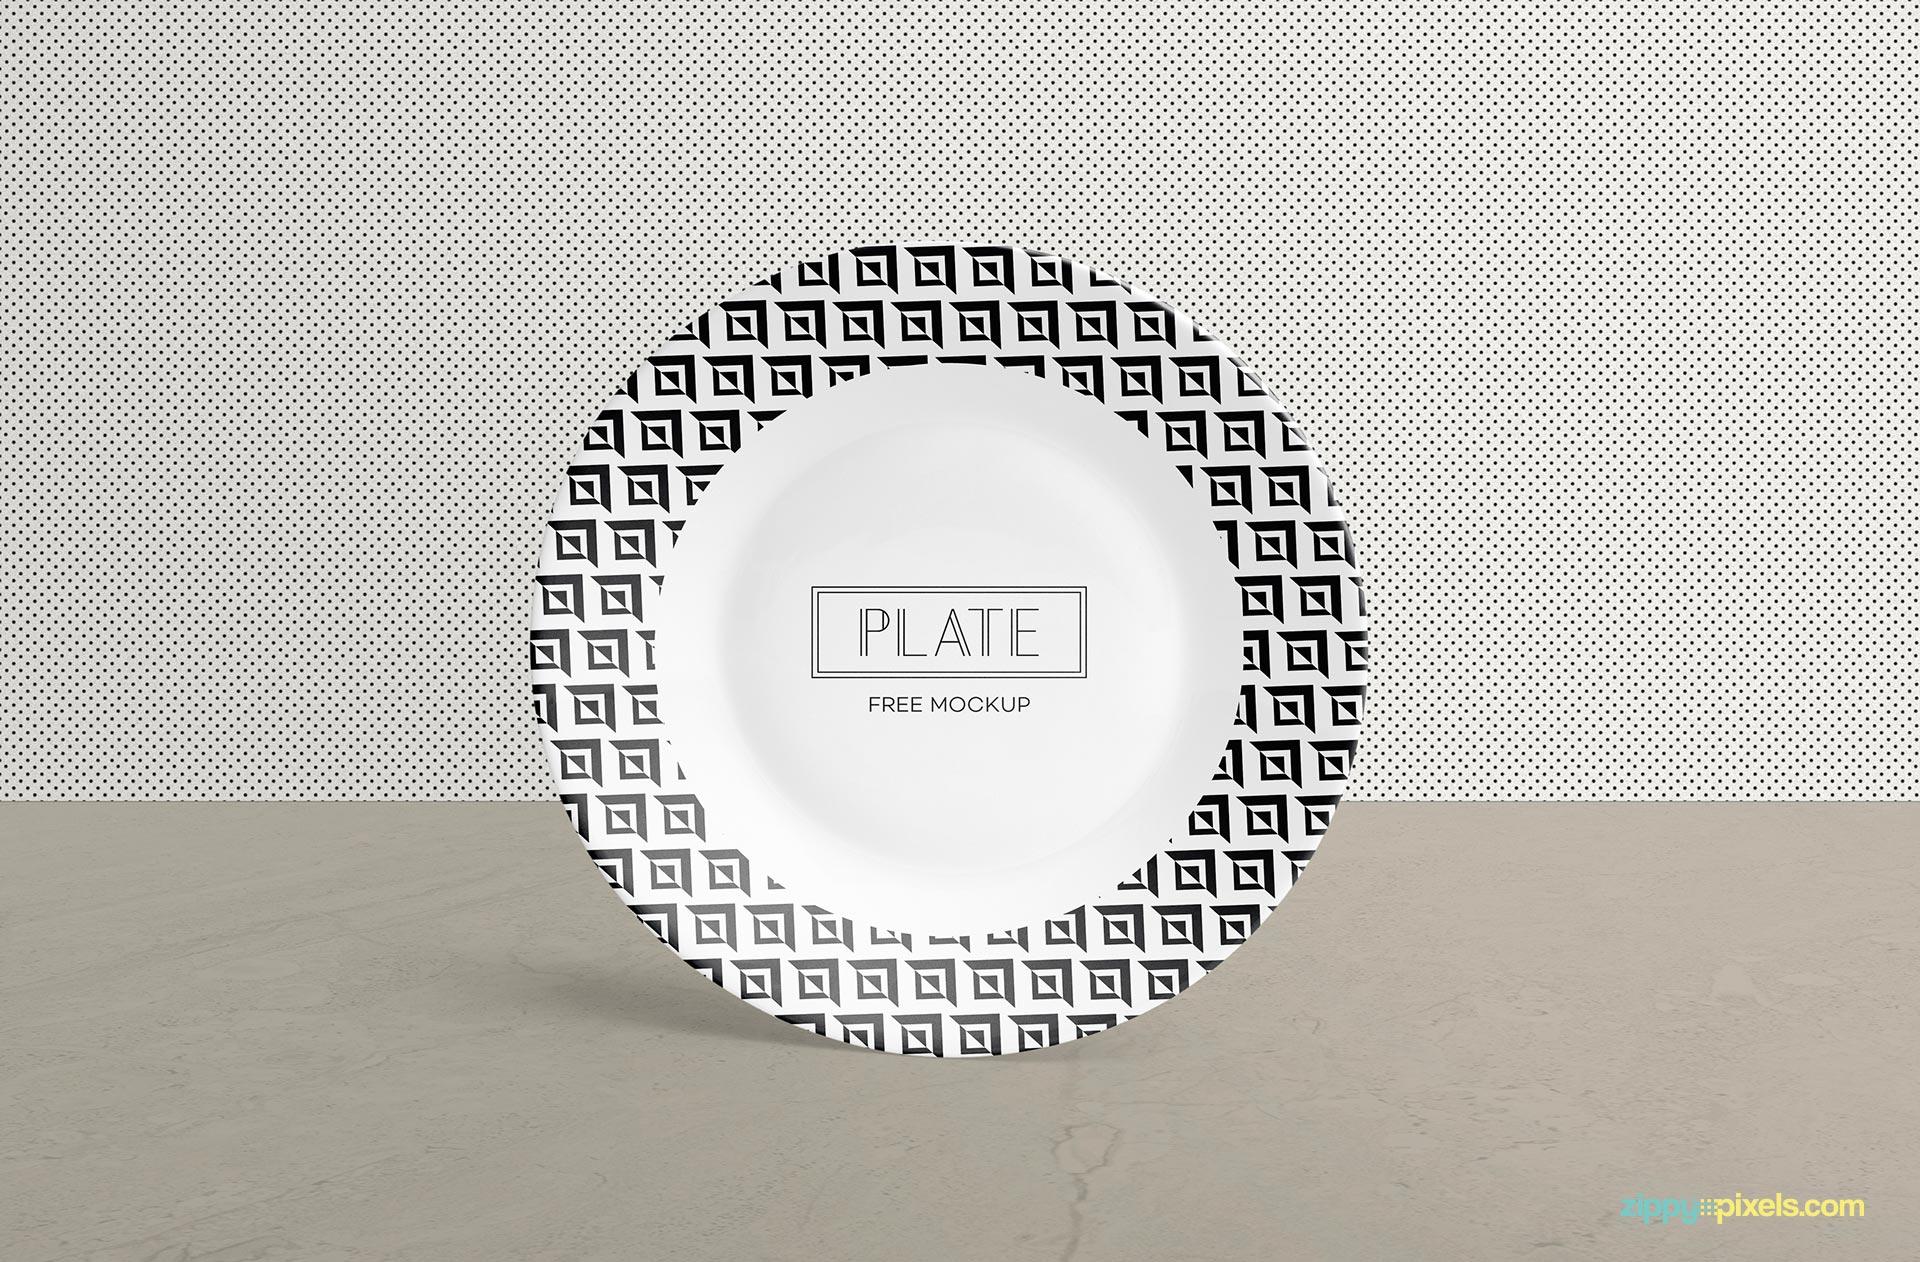 Free plate mockup.